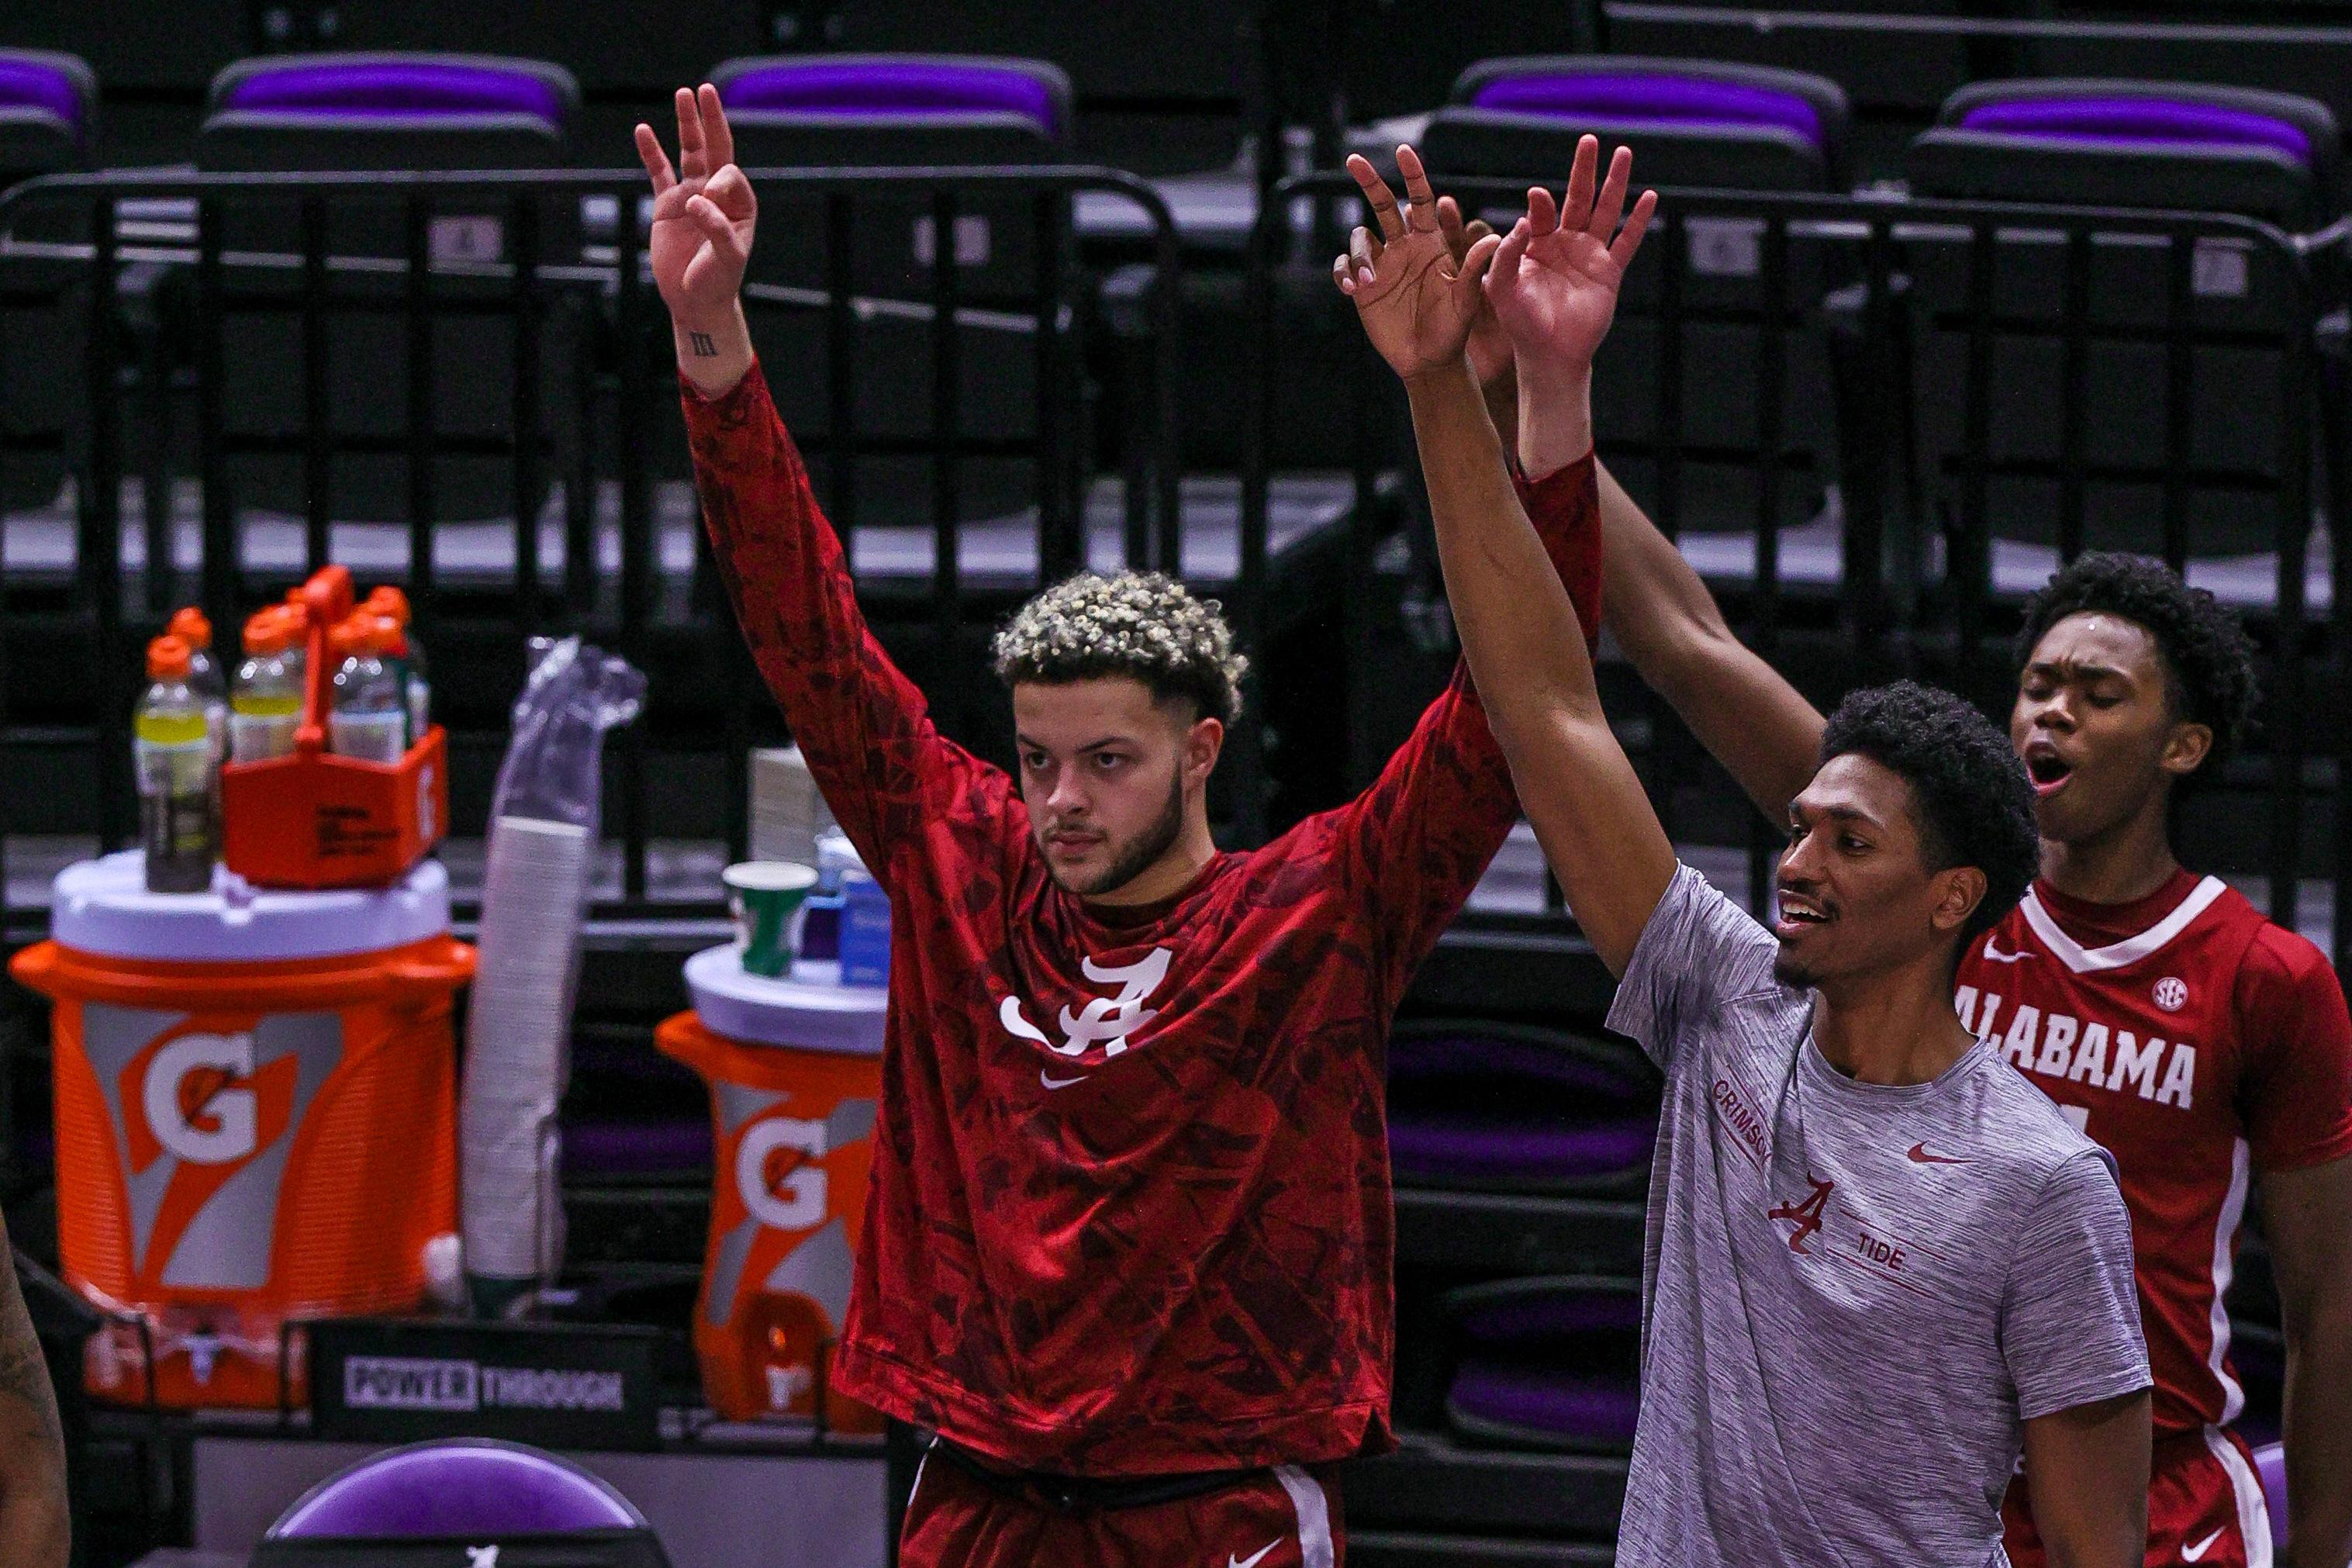 NCAA Basketball: Alabama at Louisiana State